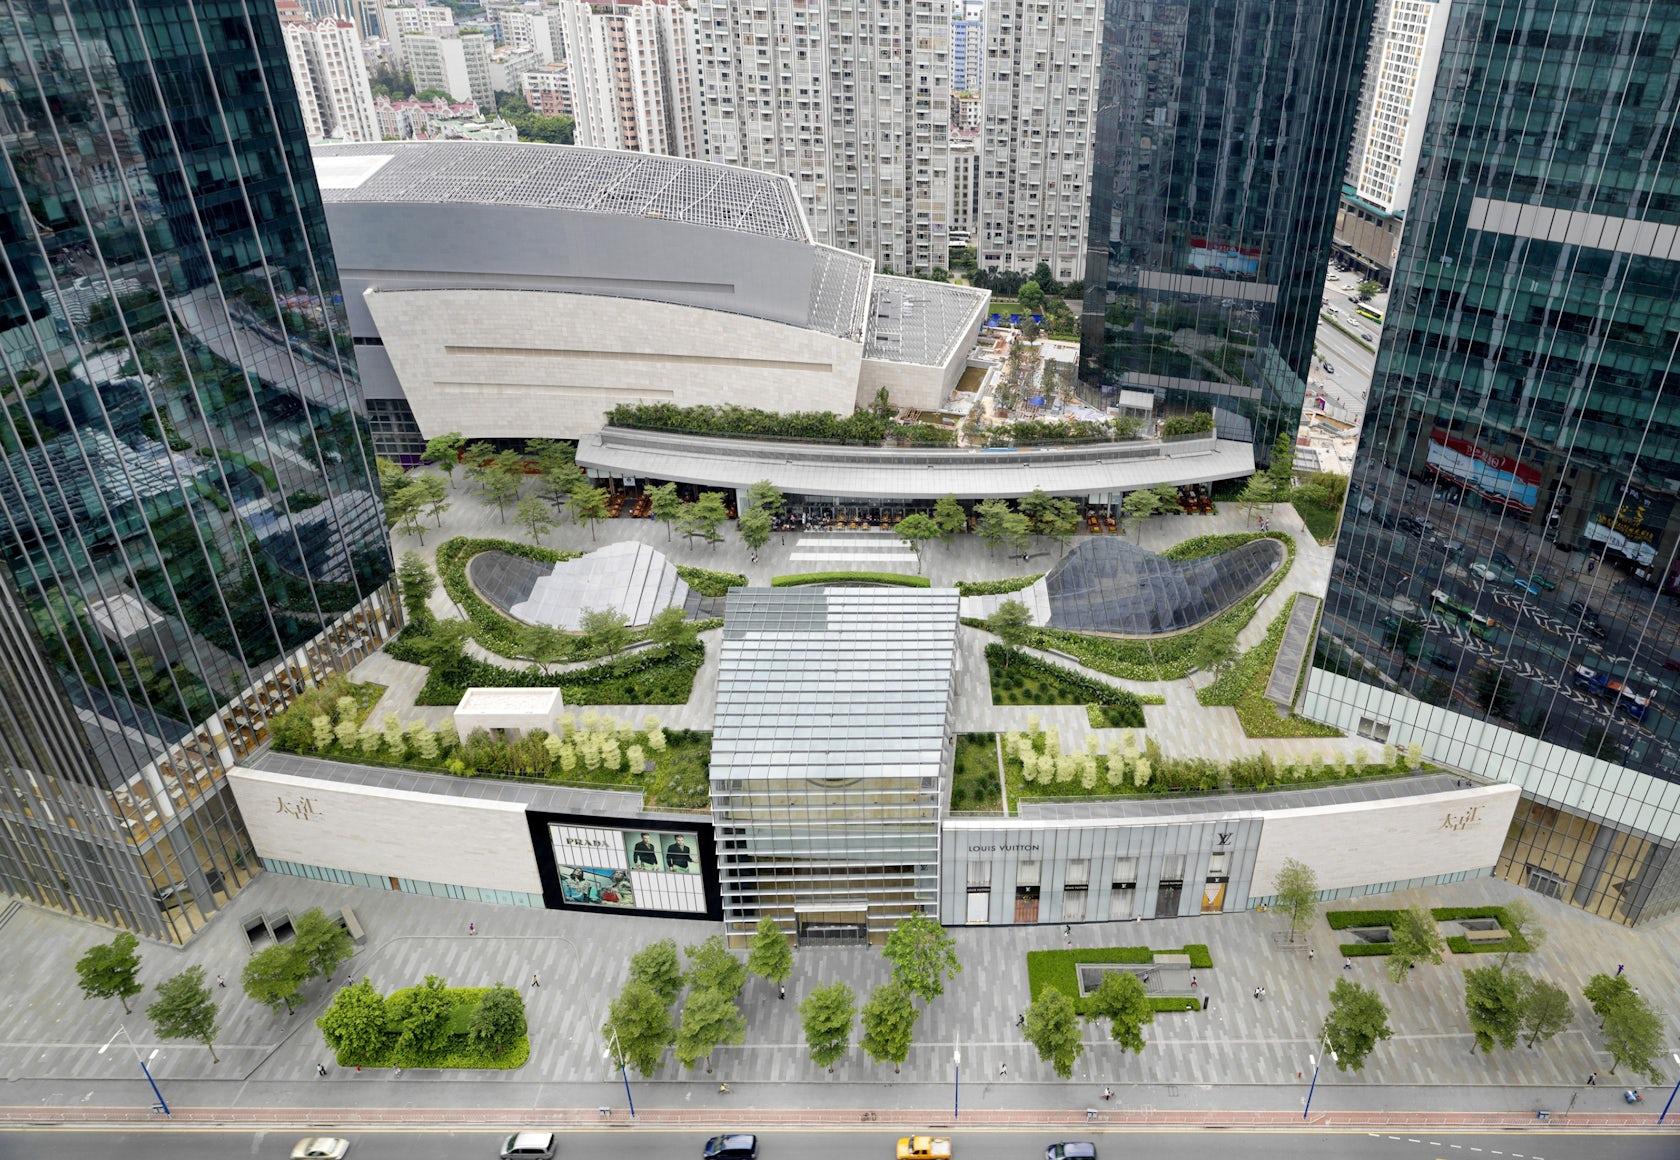 Taikoo hui green roof and plazas architizer - Jonathan s restaurant garden city ...